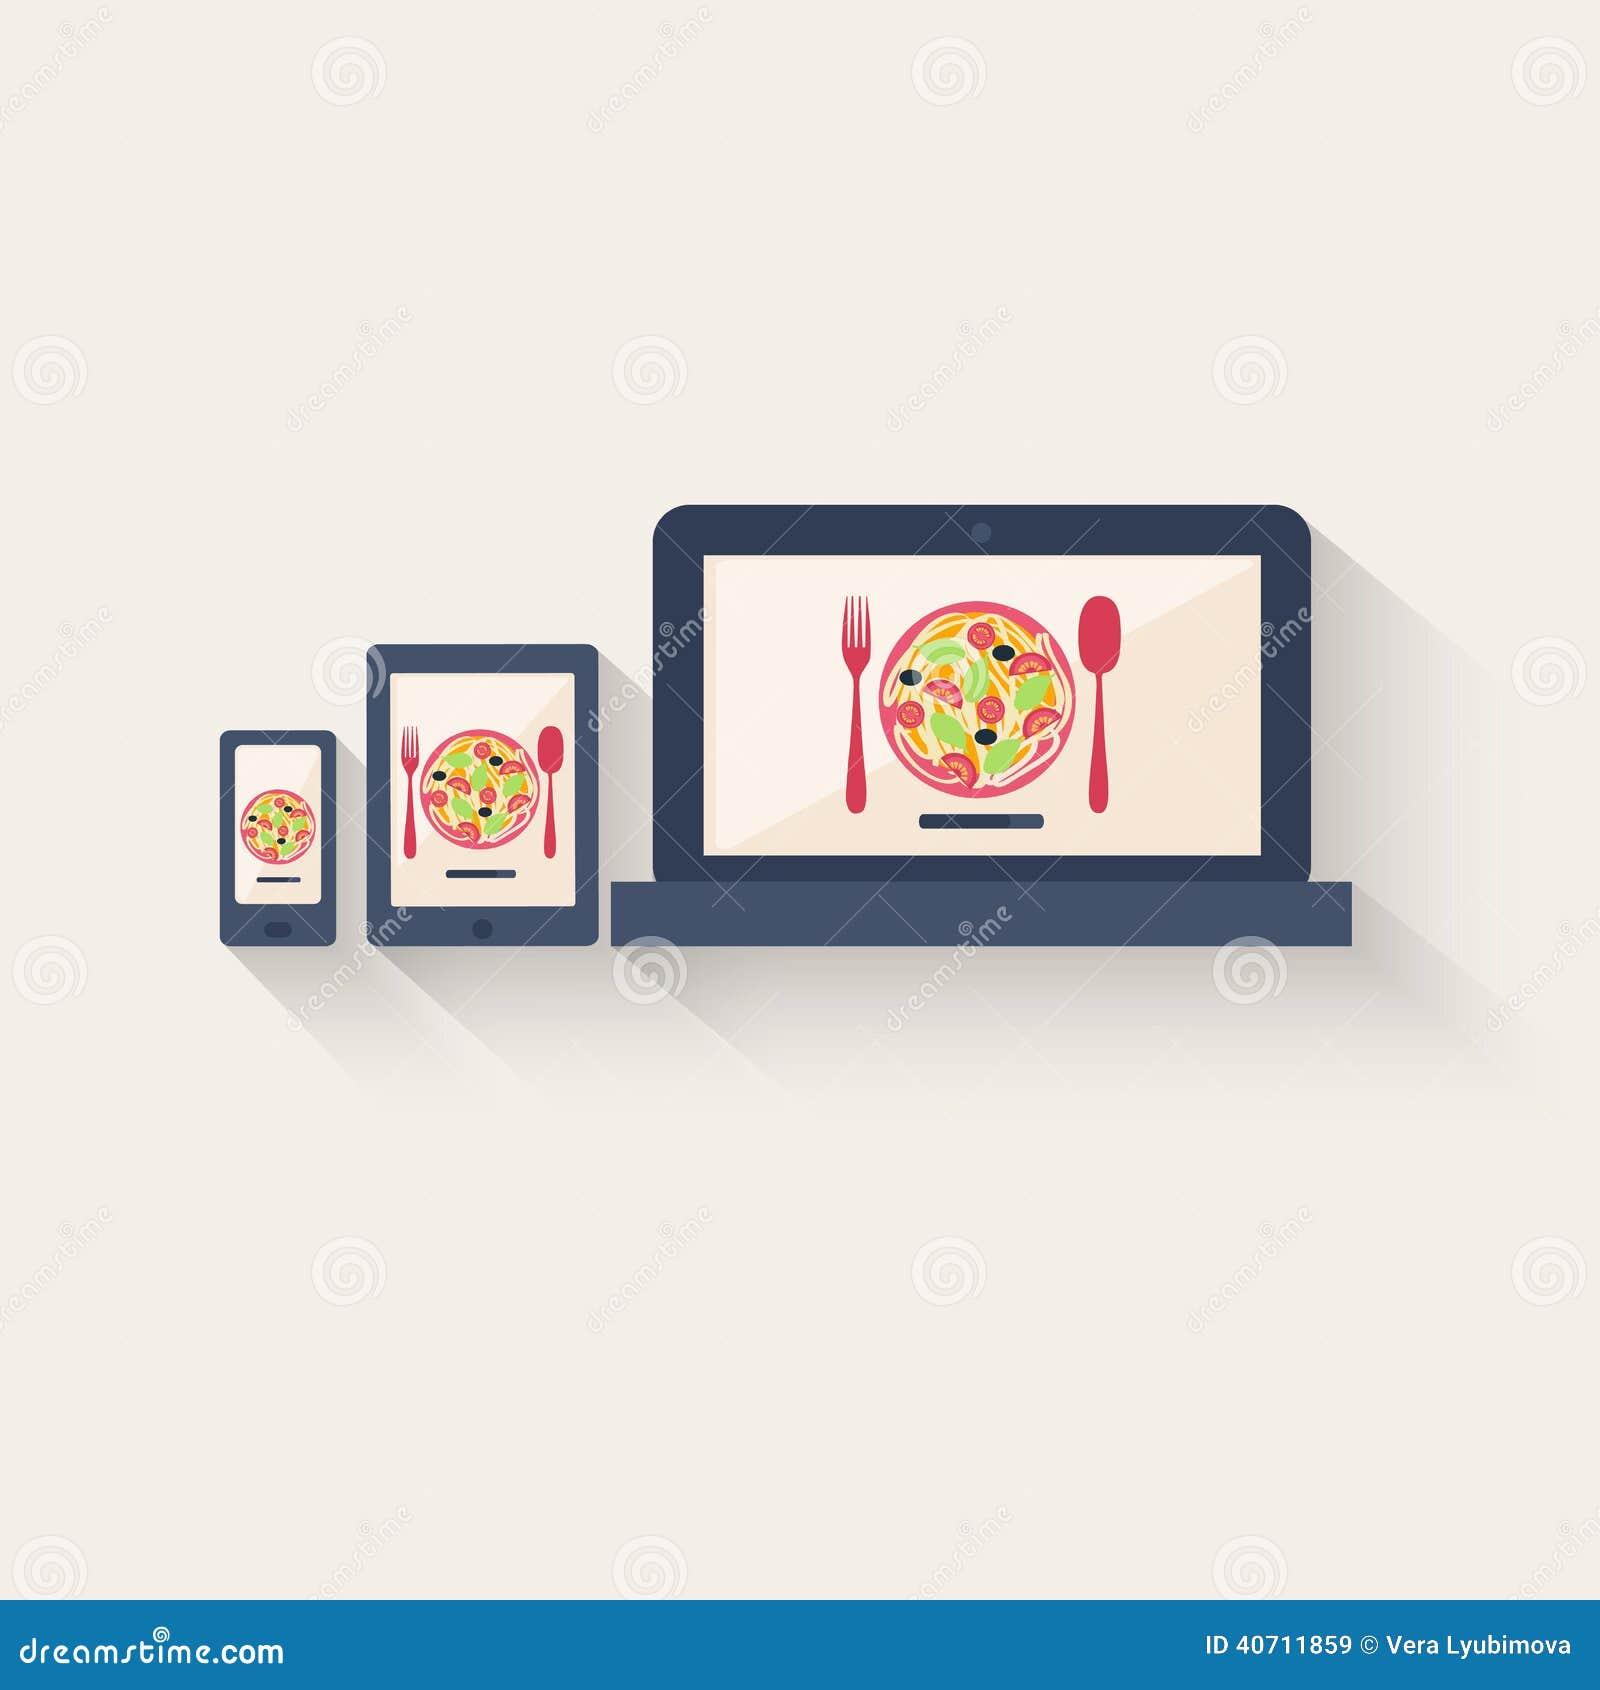 Itaian pasta menu online